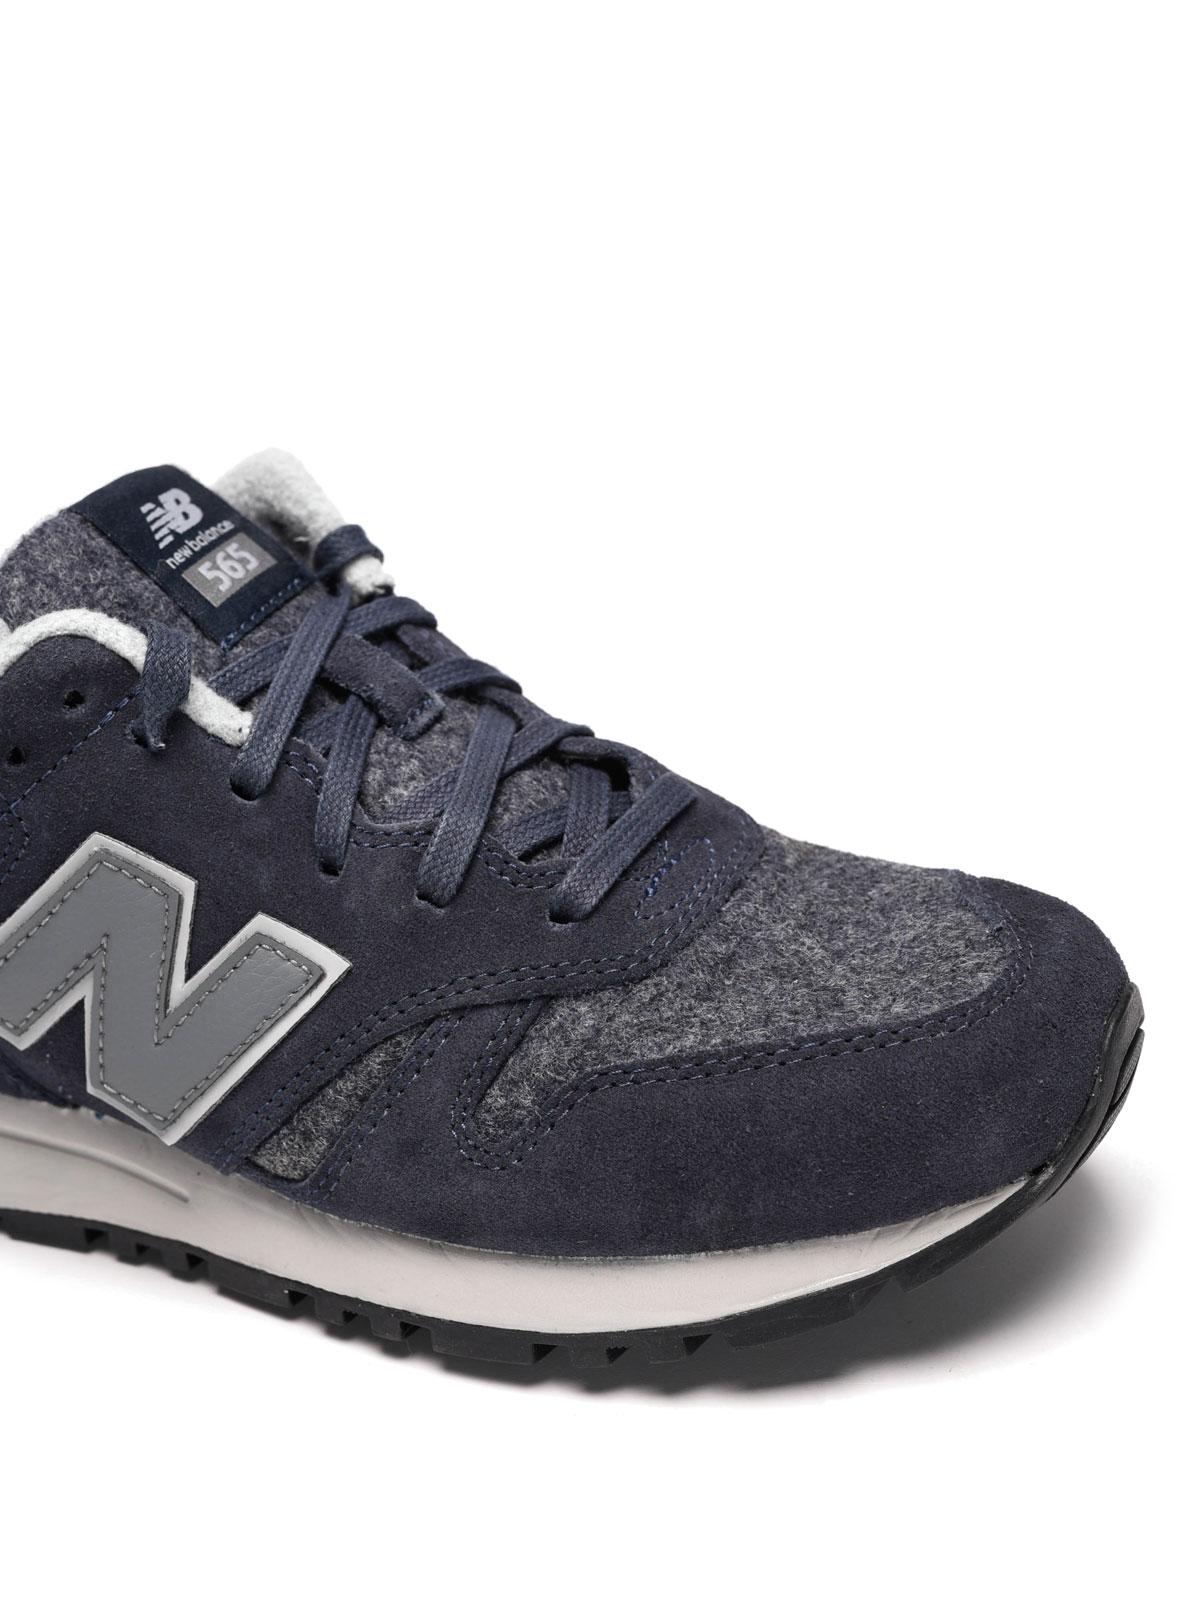 new balance 565 homme